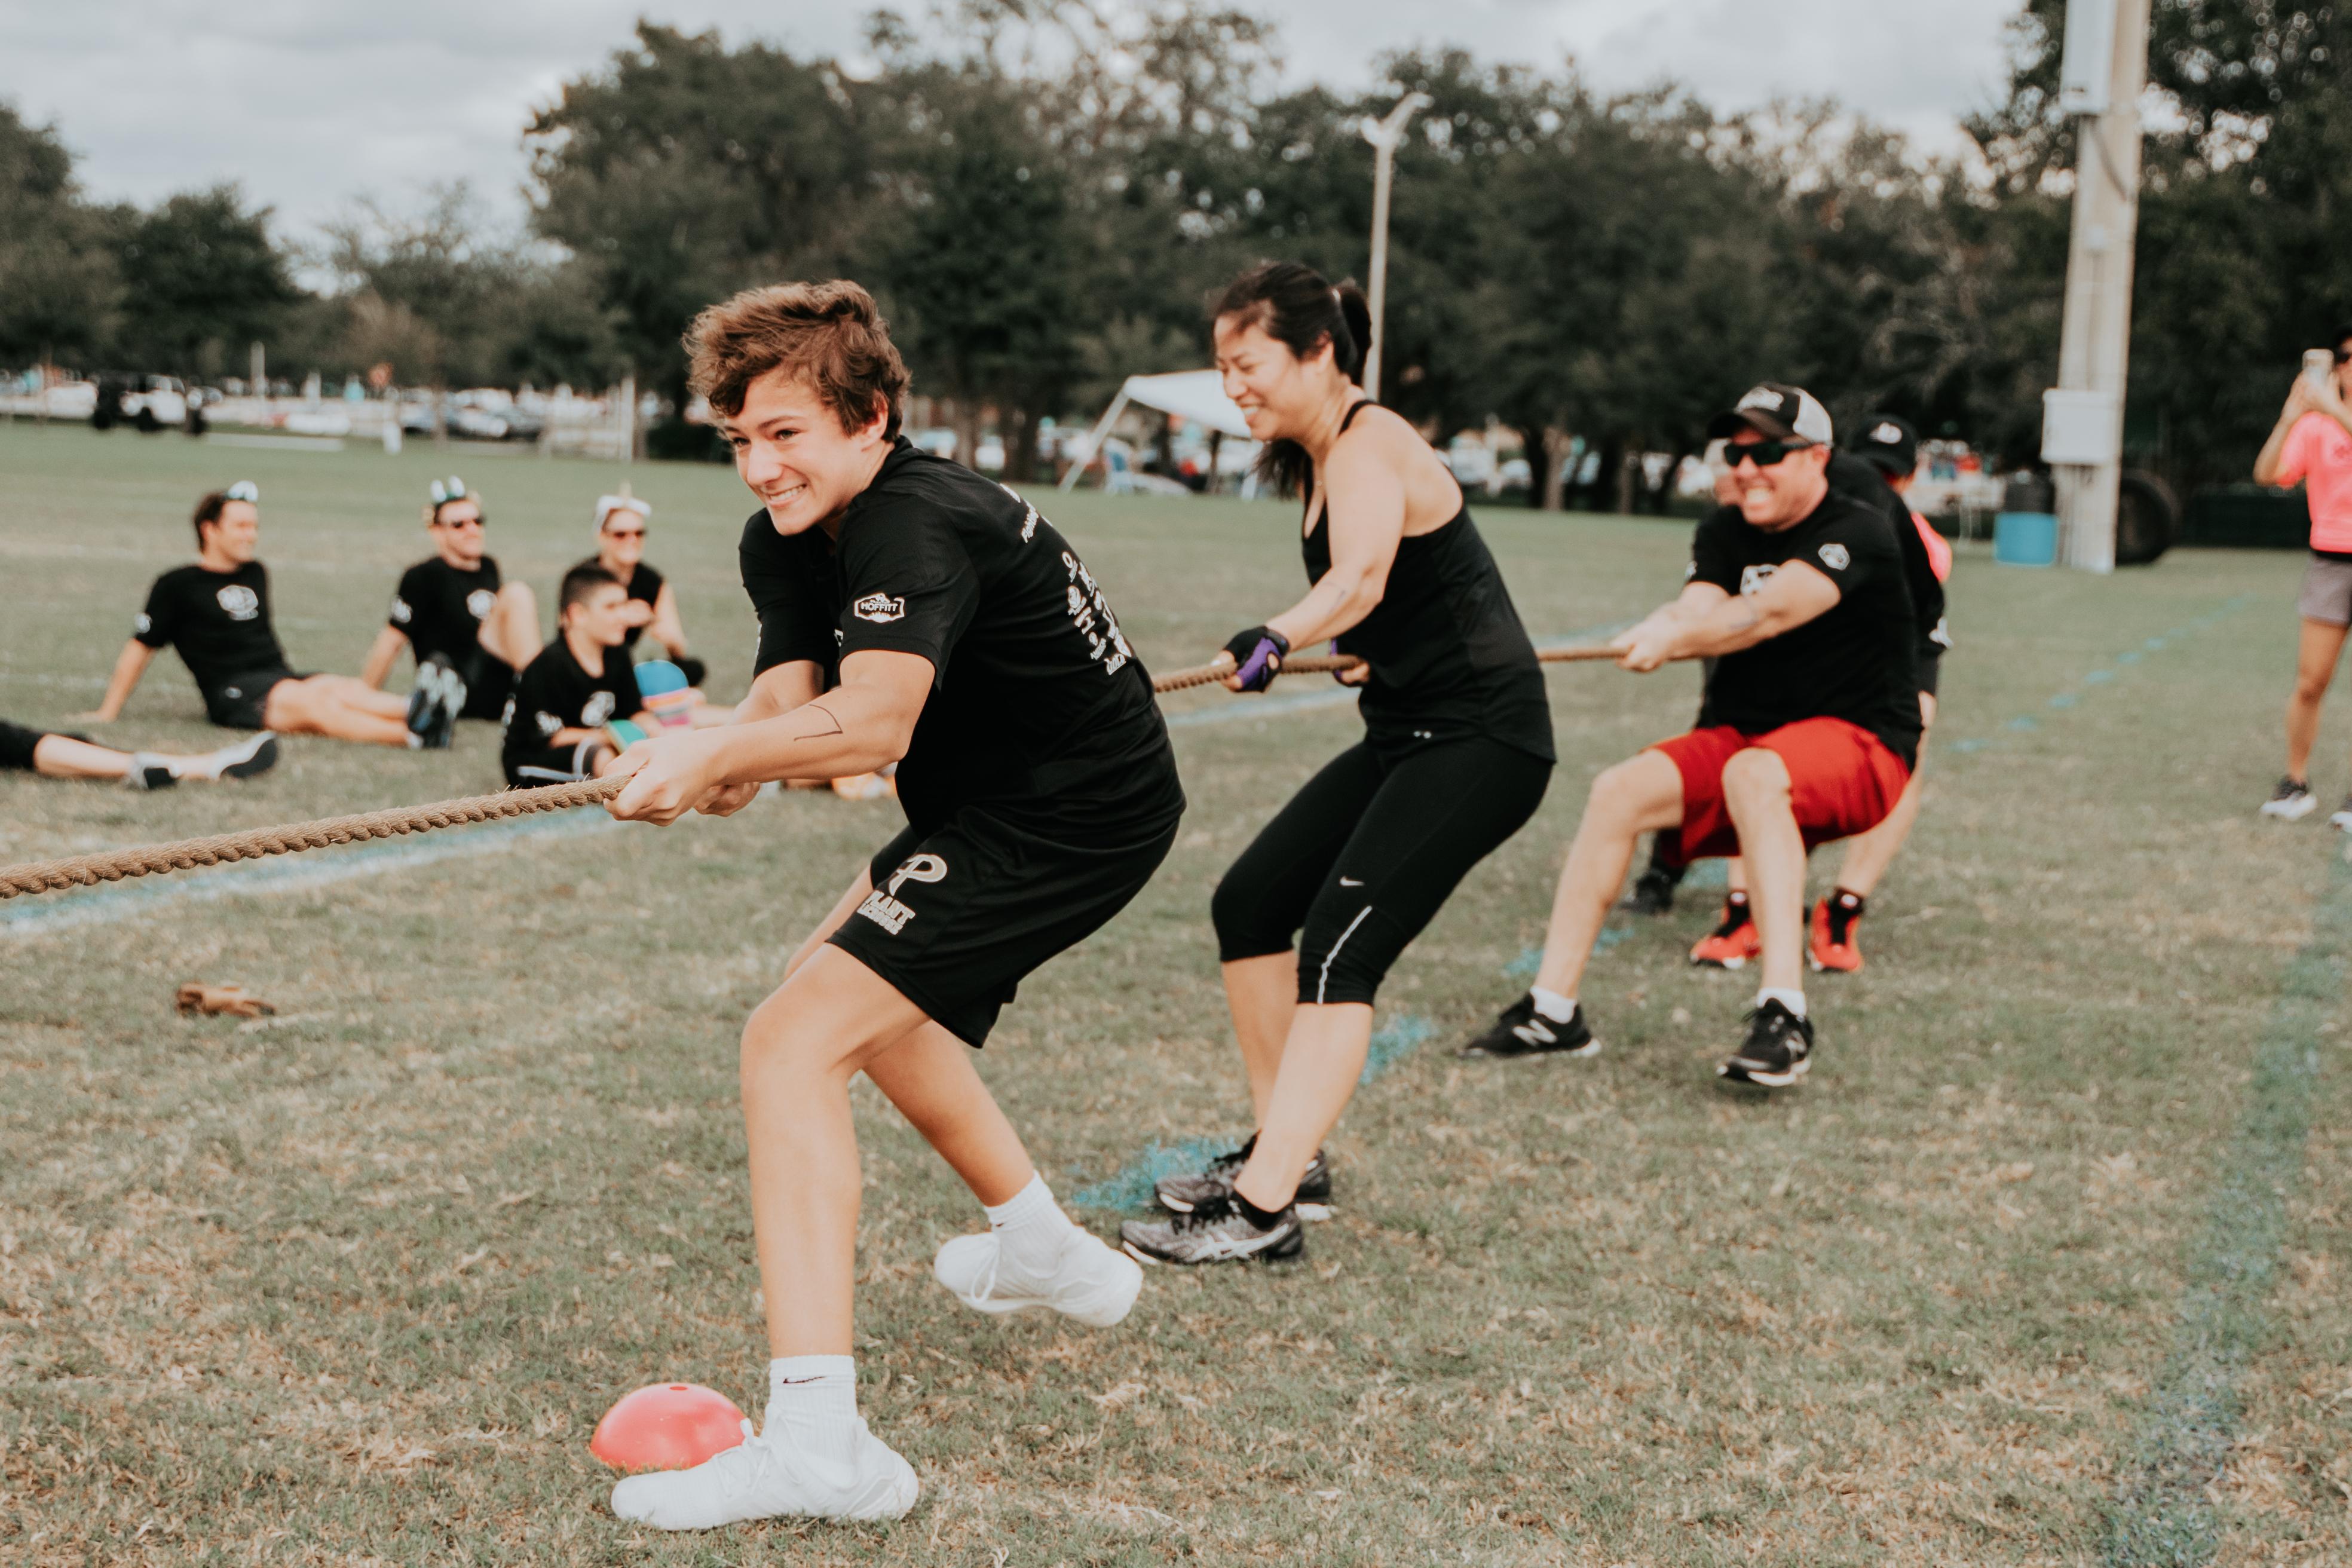 Drivenfit Tampa XFIT games 2019